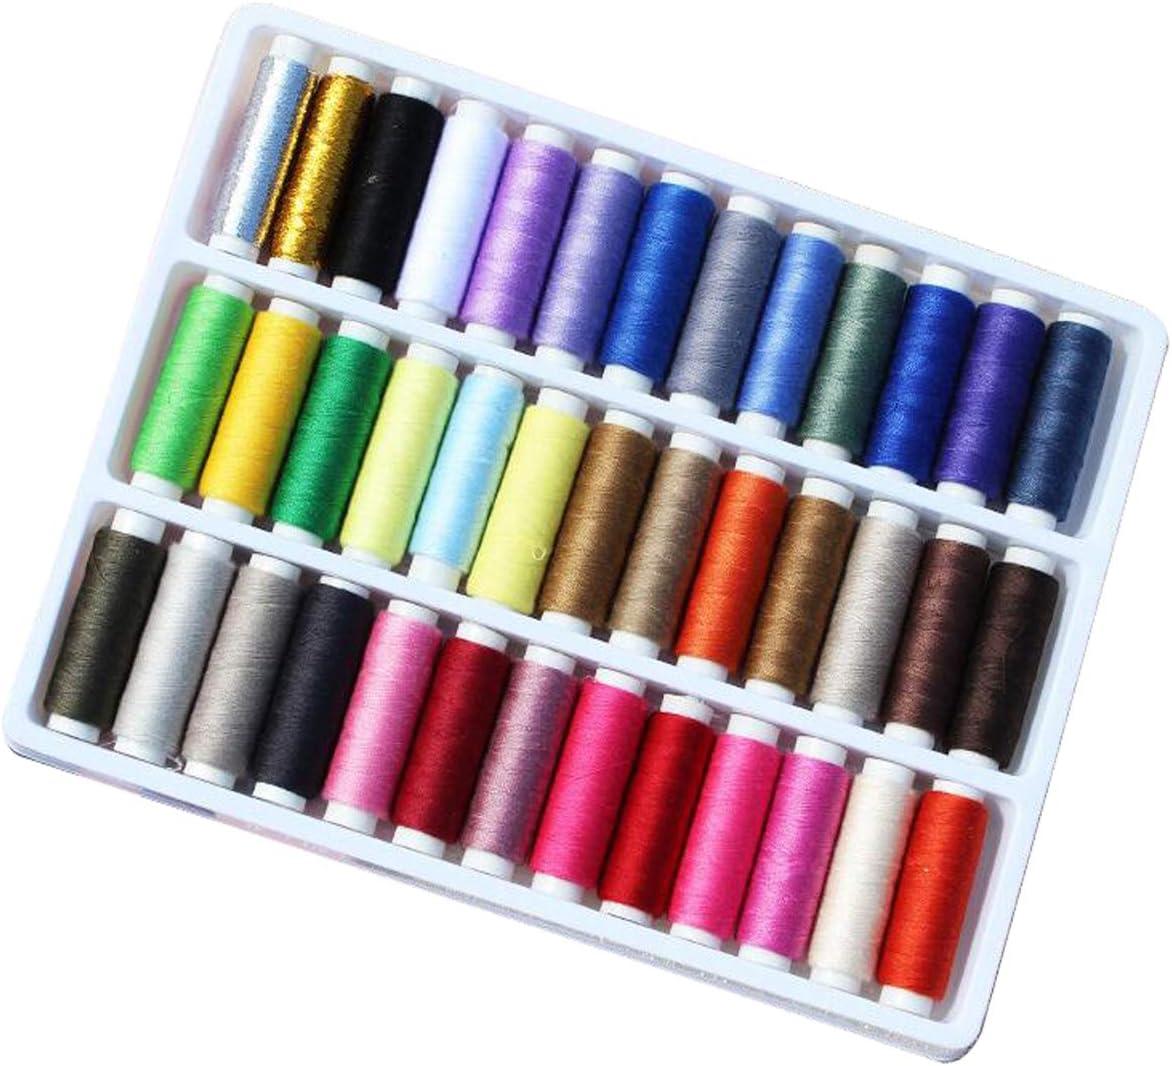 Mucho Color Ideal para Acolchar Coser a Mano Coser 39 packs RYTECH Hilos de Coser Hilo Fuerte para Coser a Mano en m/áquinas de Coser